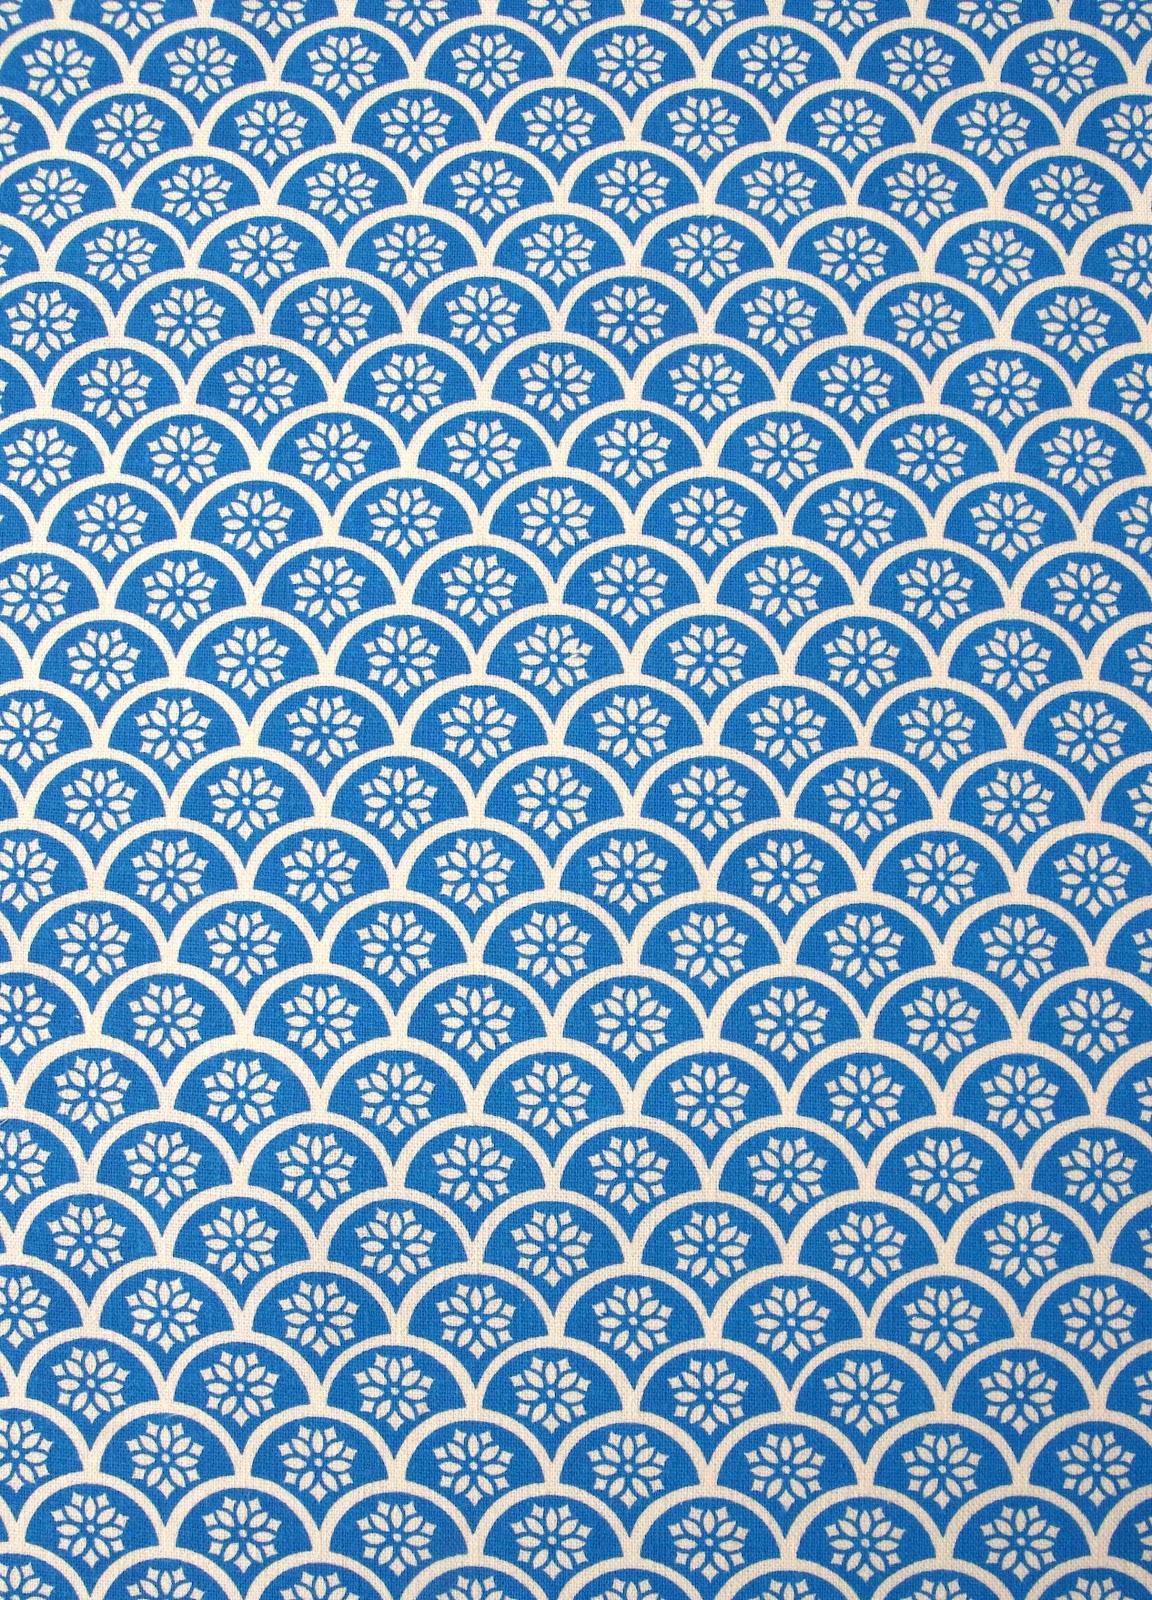 Yardage Design Hand Printed Fabric And Homewares New